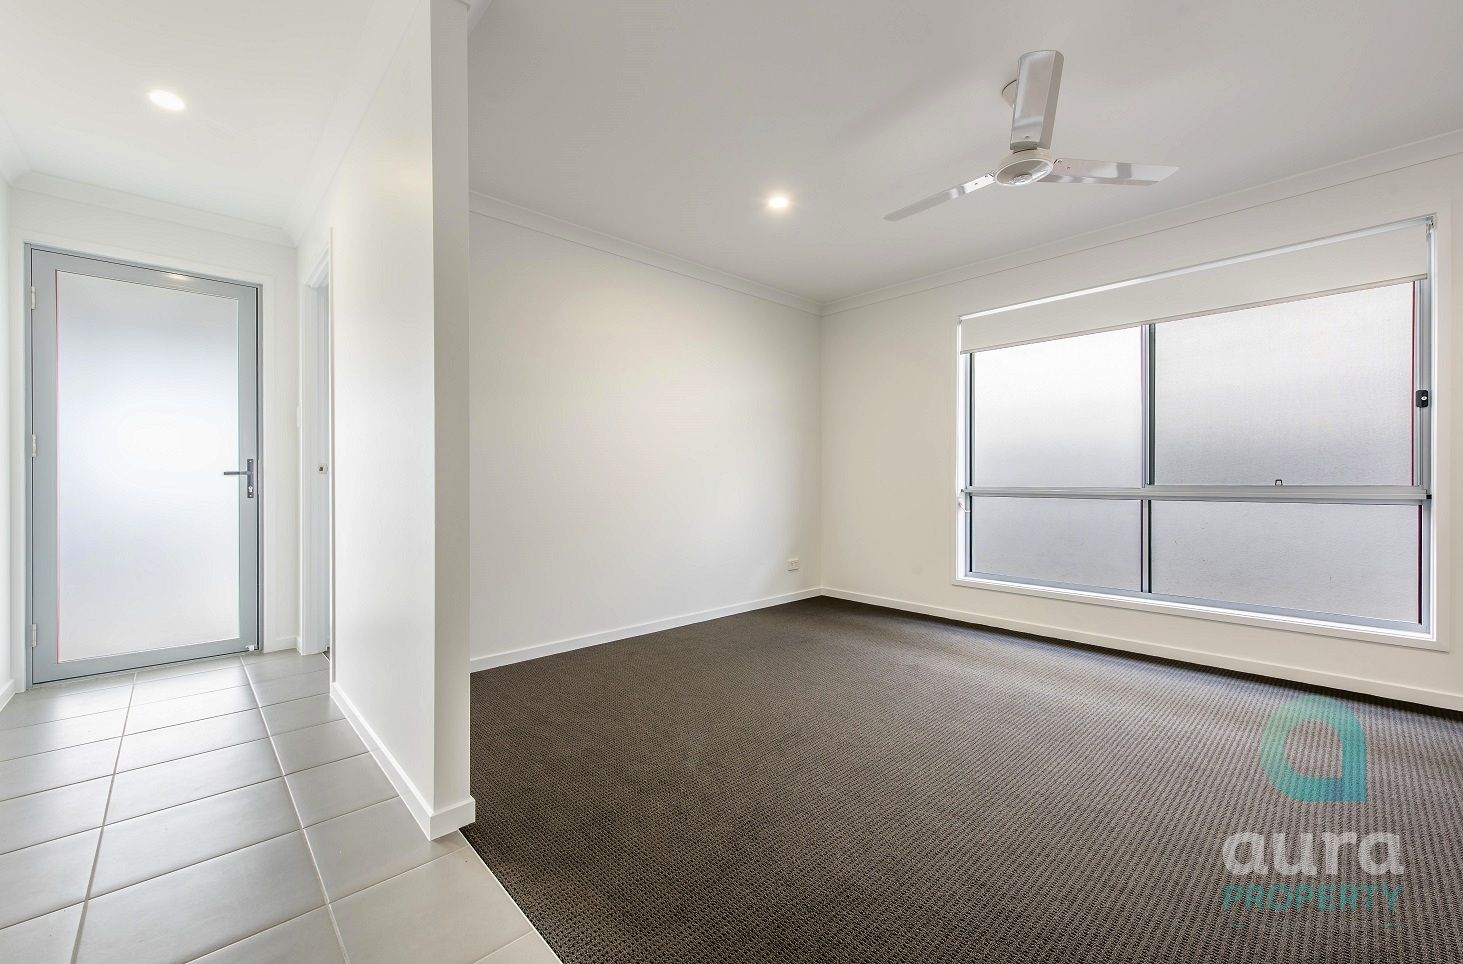 104 Steiner St, Caloundra West QLD 4551, Image 1